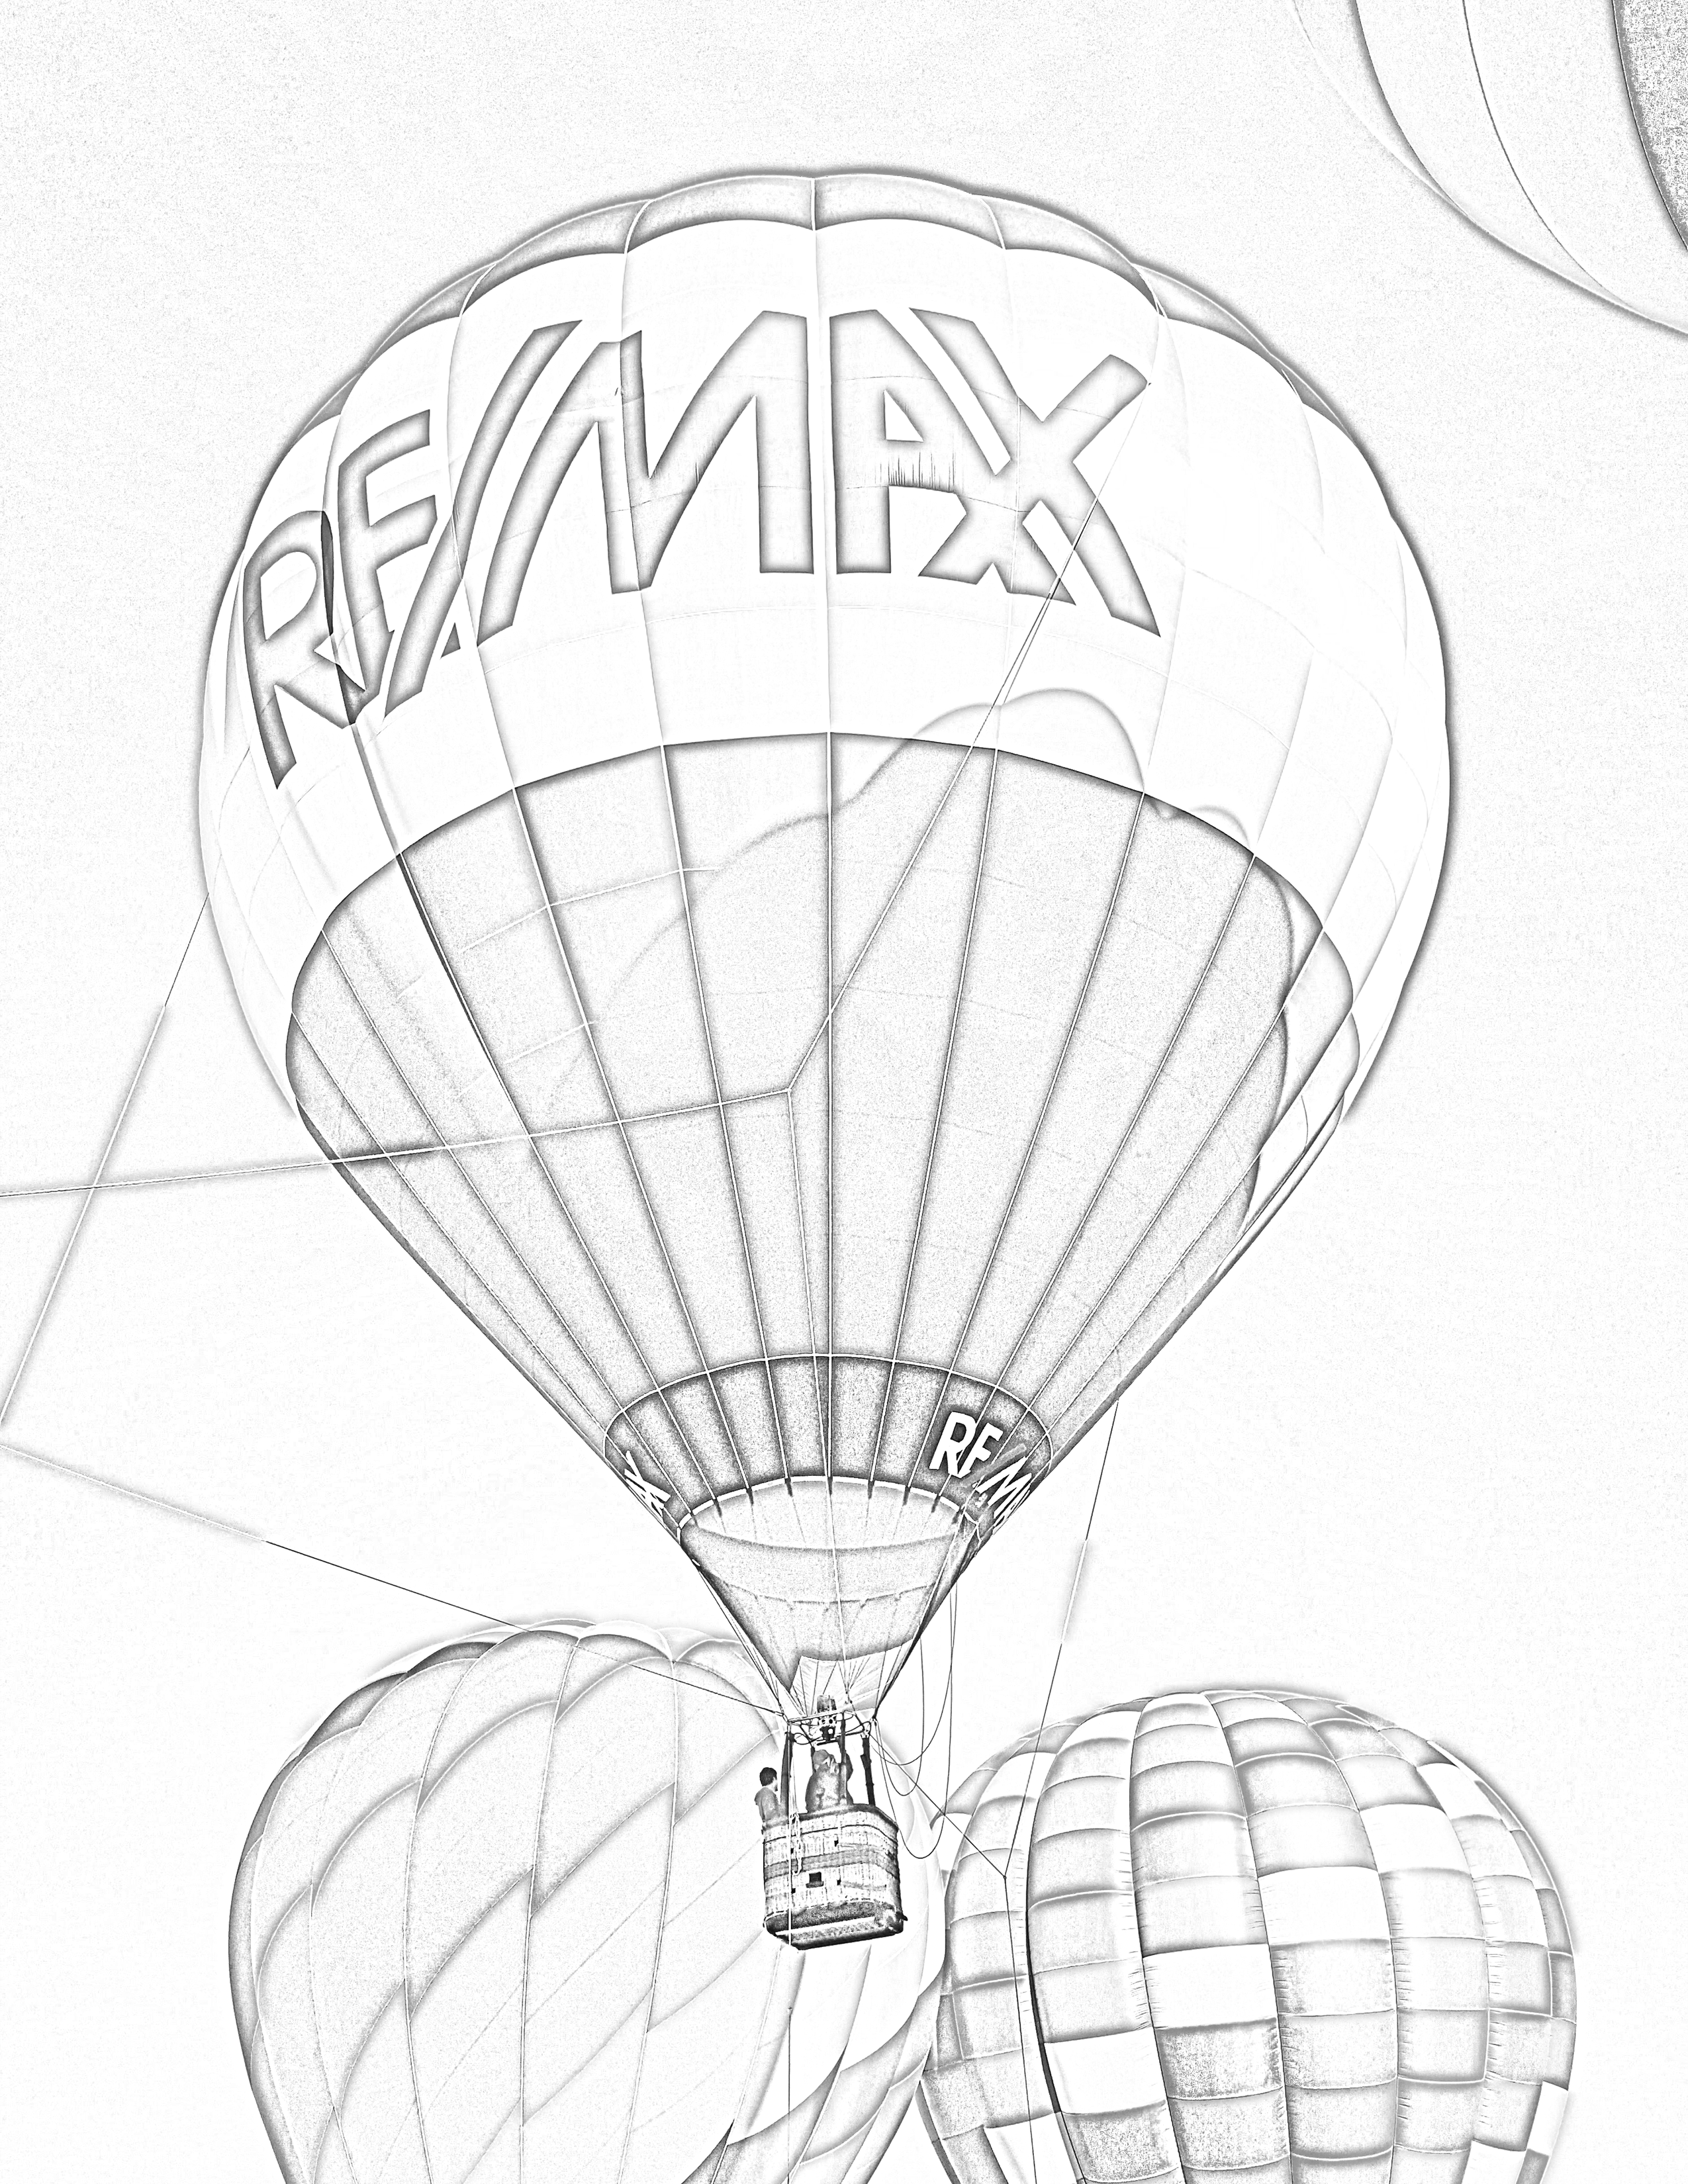 RE/MAX hot air balloon coloring page. #hotairballoonday